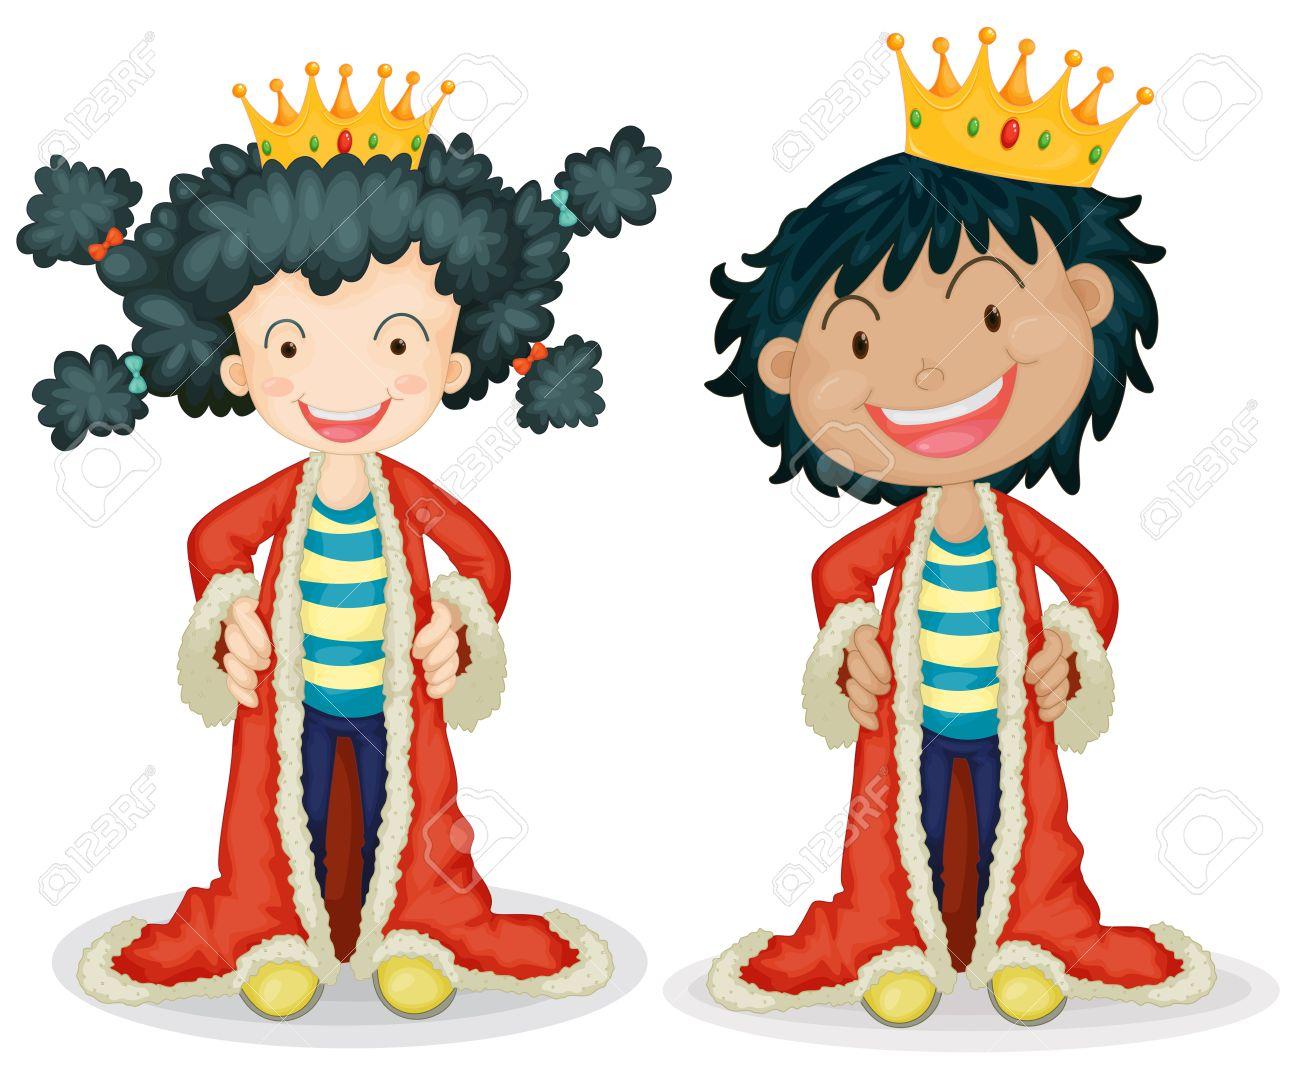 Children dressing up as king.